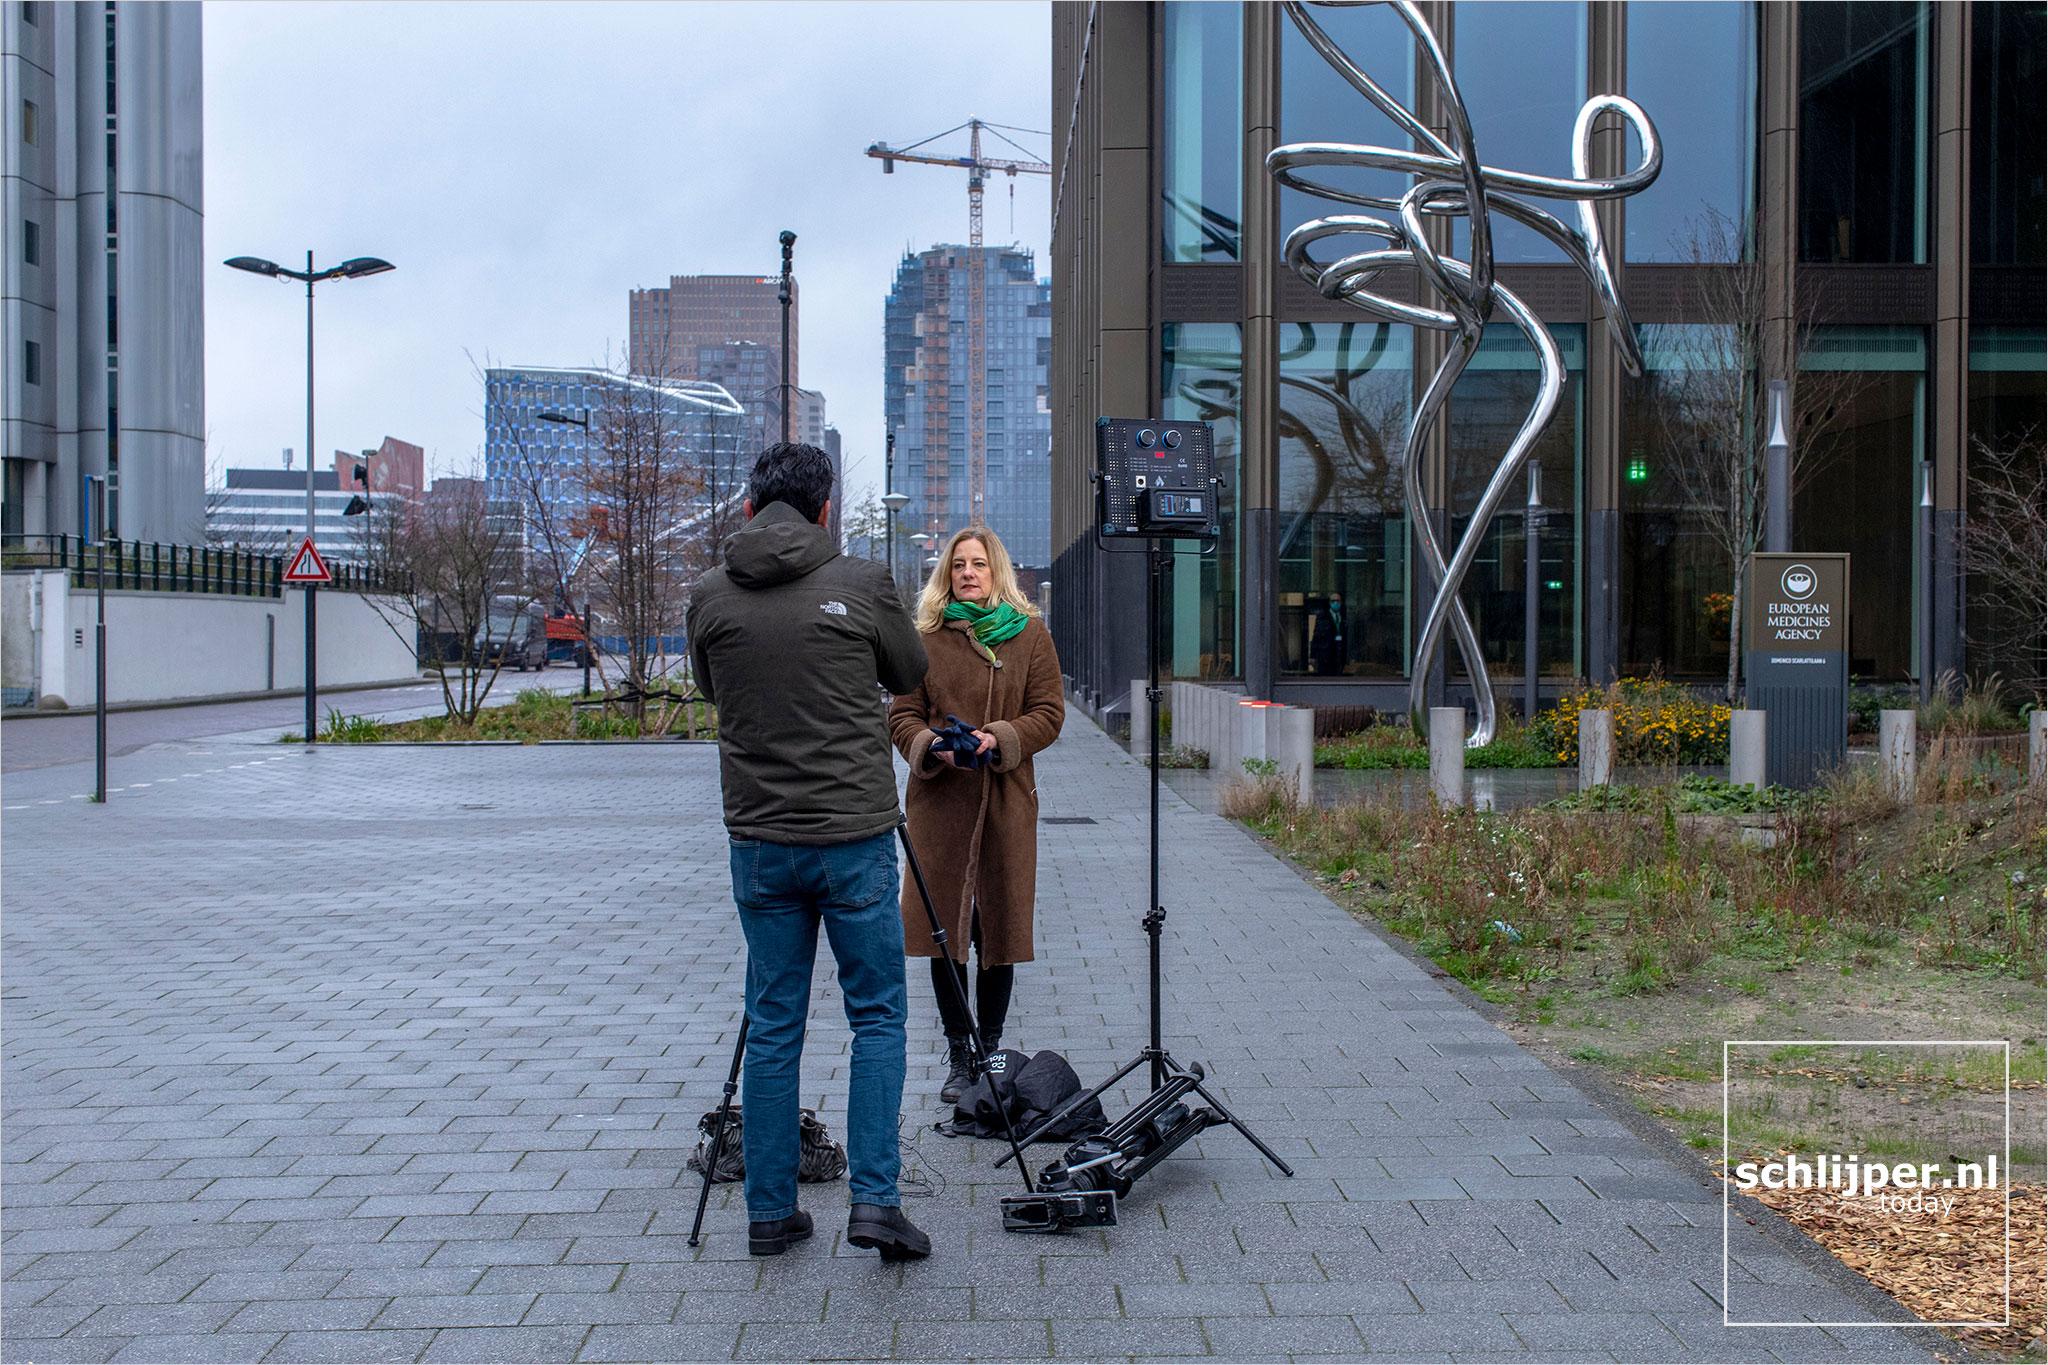 The Netherlands, Amsterdam, 21 december 2020